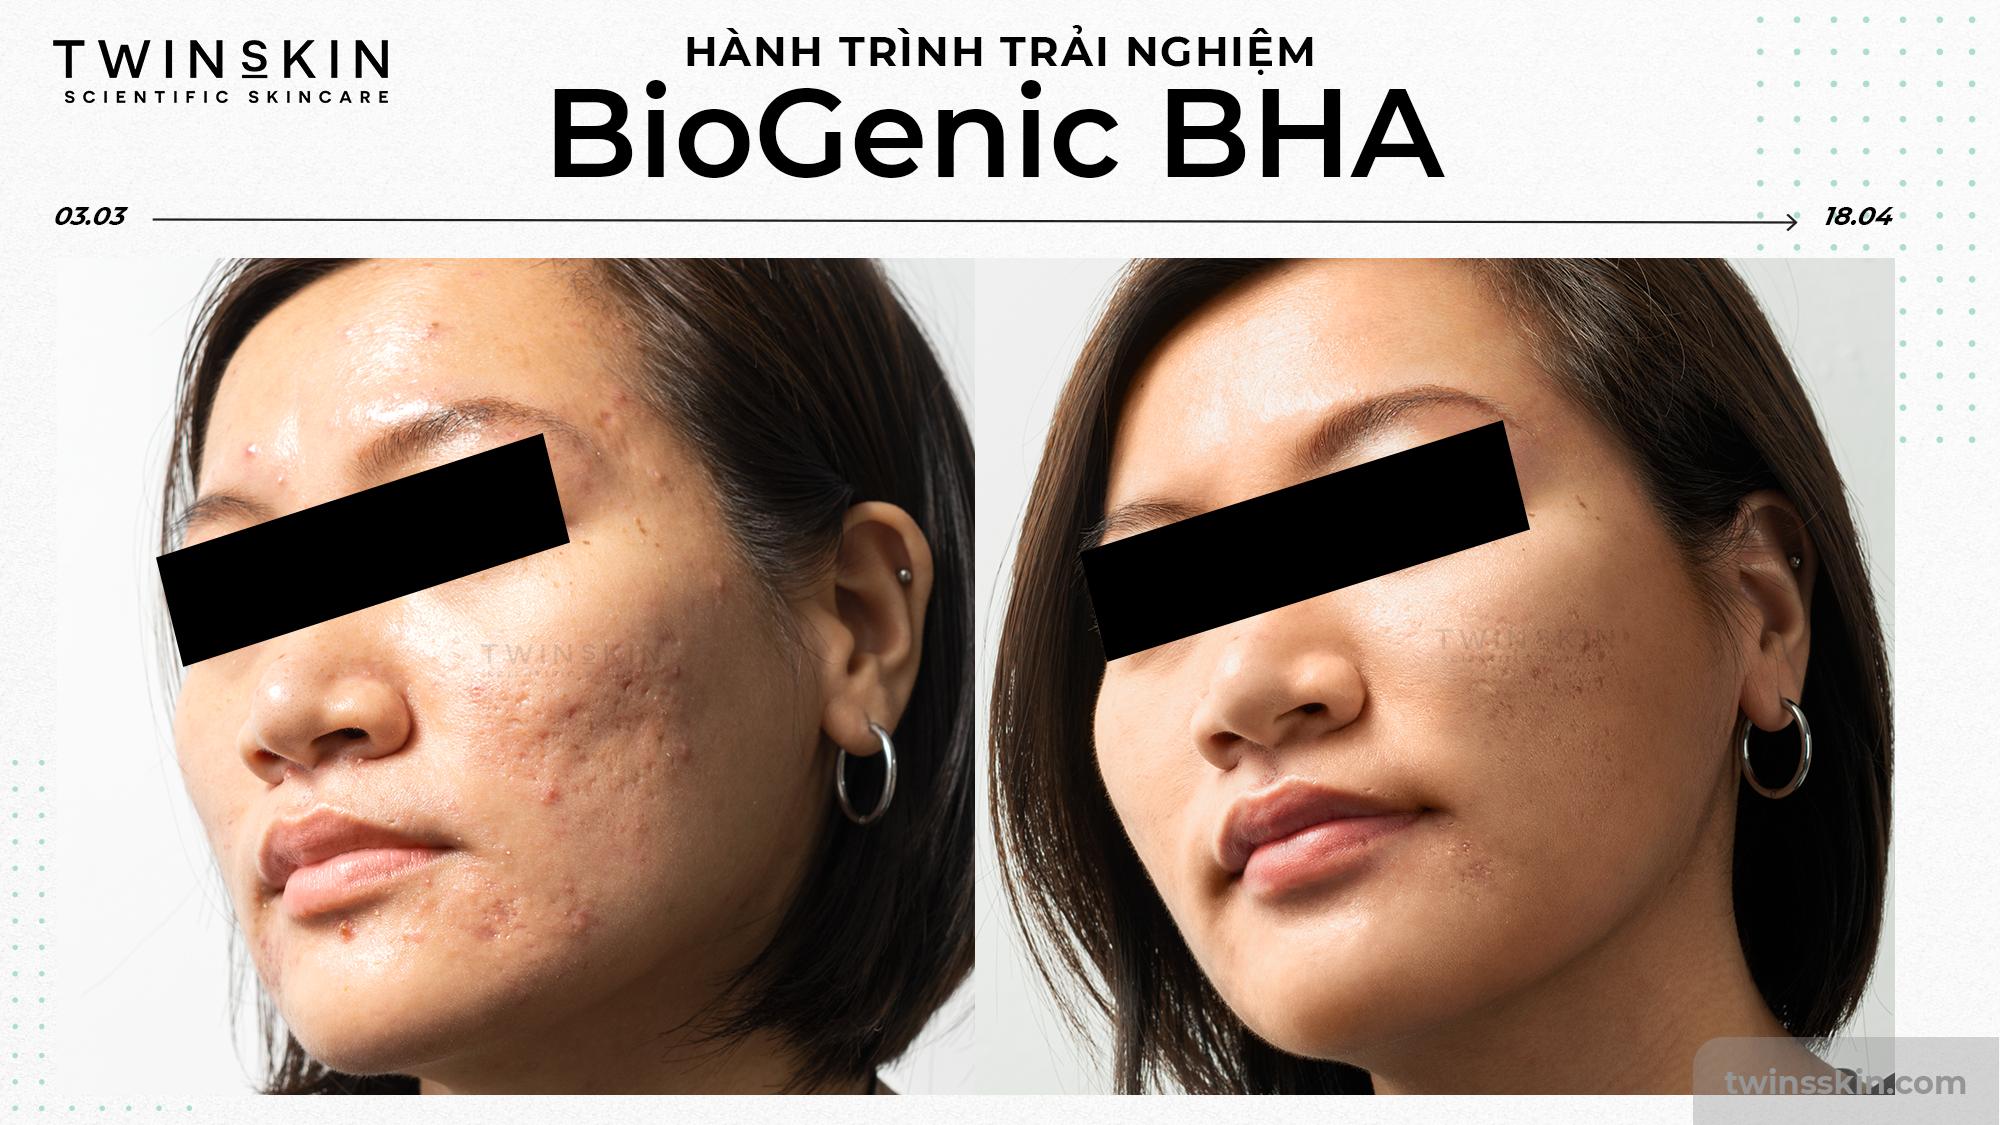 feedback-biogenicbha-banner-LP-2000x1125_1